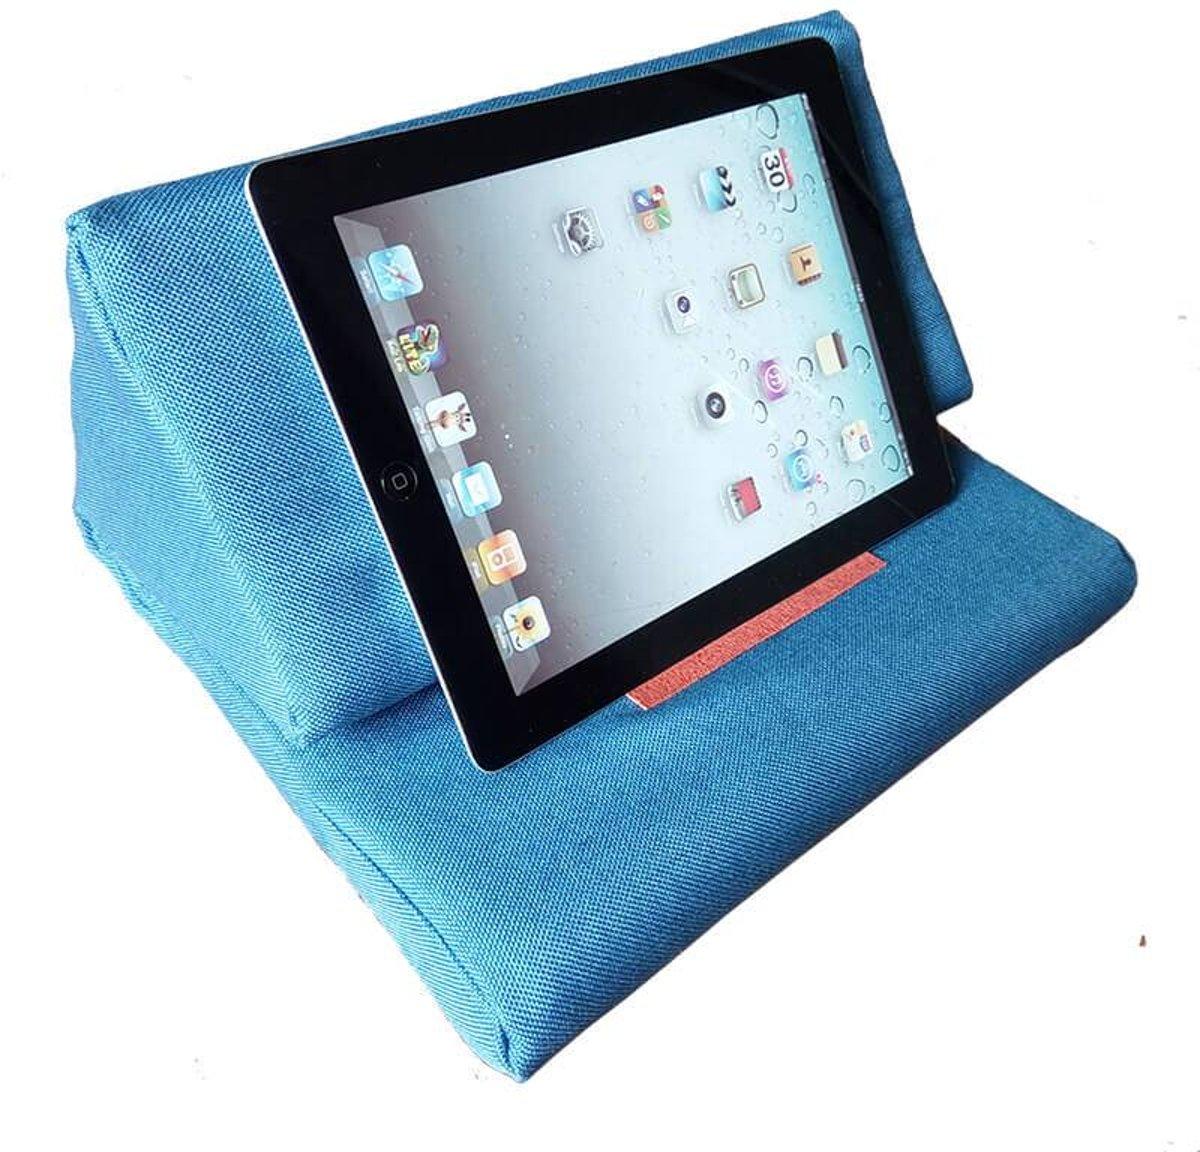 iPad kussen licht blauw kopen